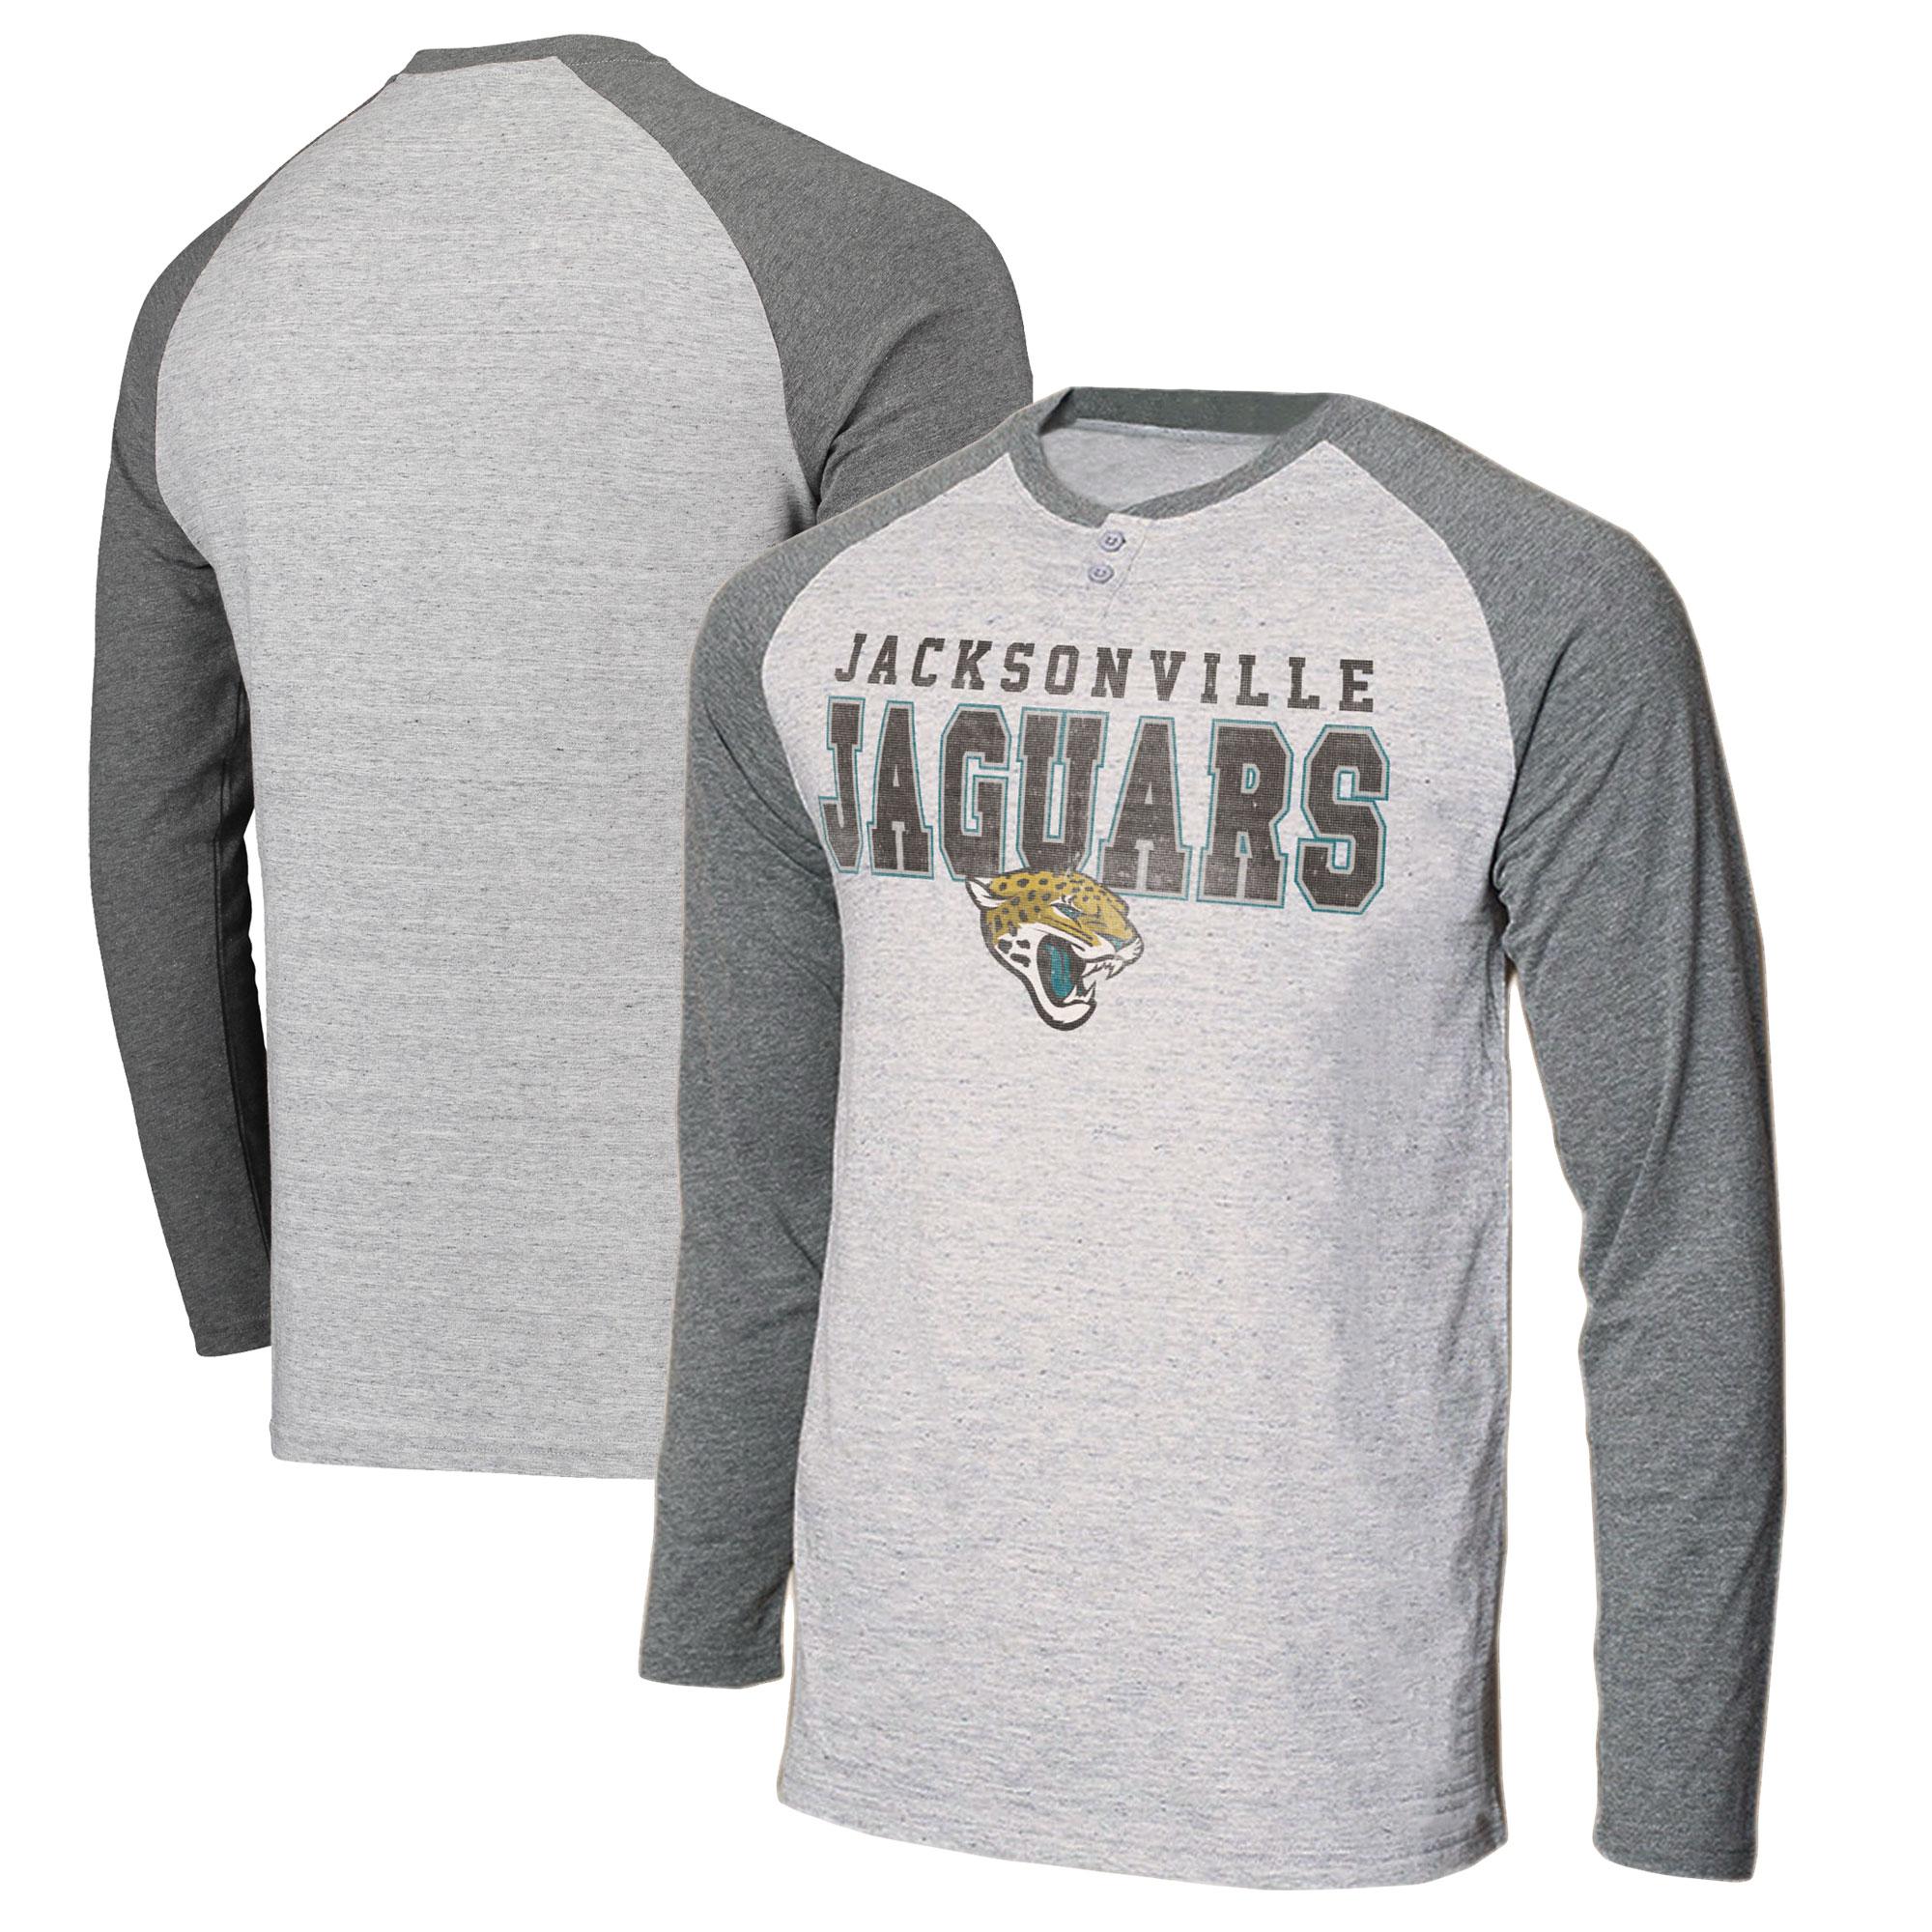 Jacksonville Jaguars Concepts Sport Hillstone Henley Raglan Long Sleeve T-Shirt - Heathered Gray/Heathered Charcoal